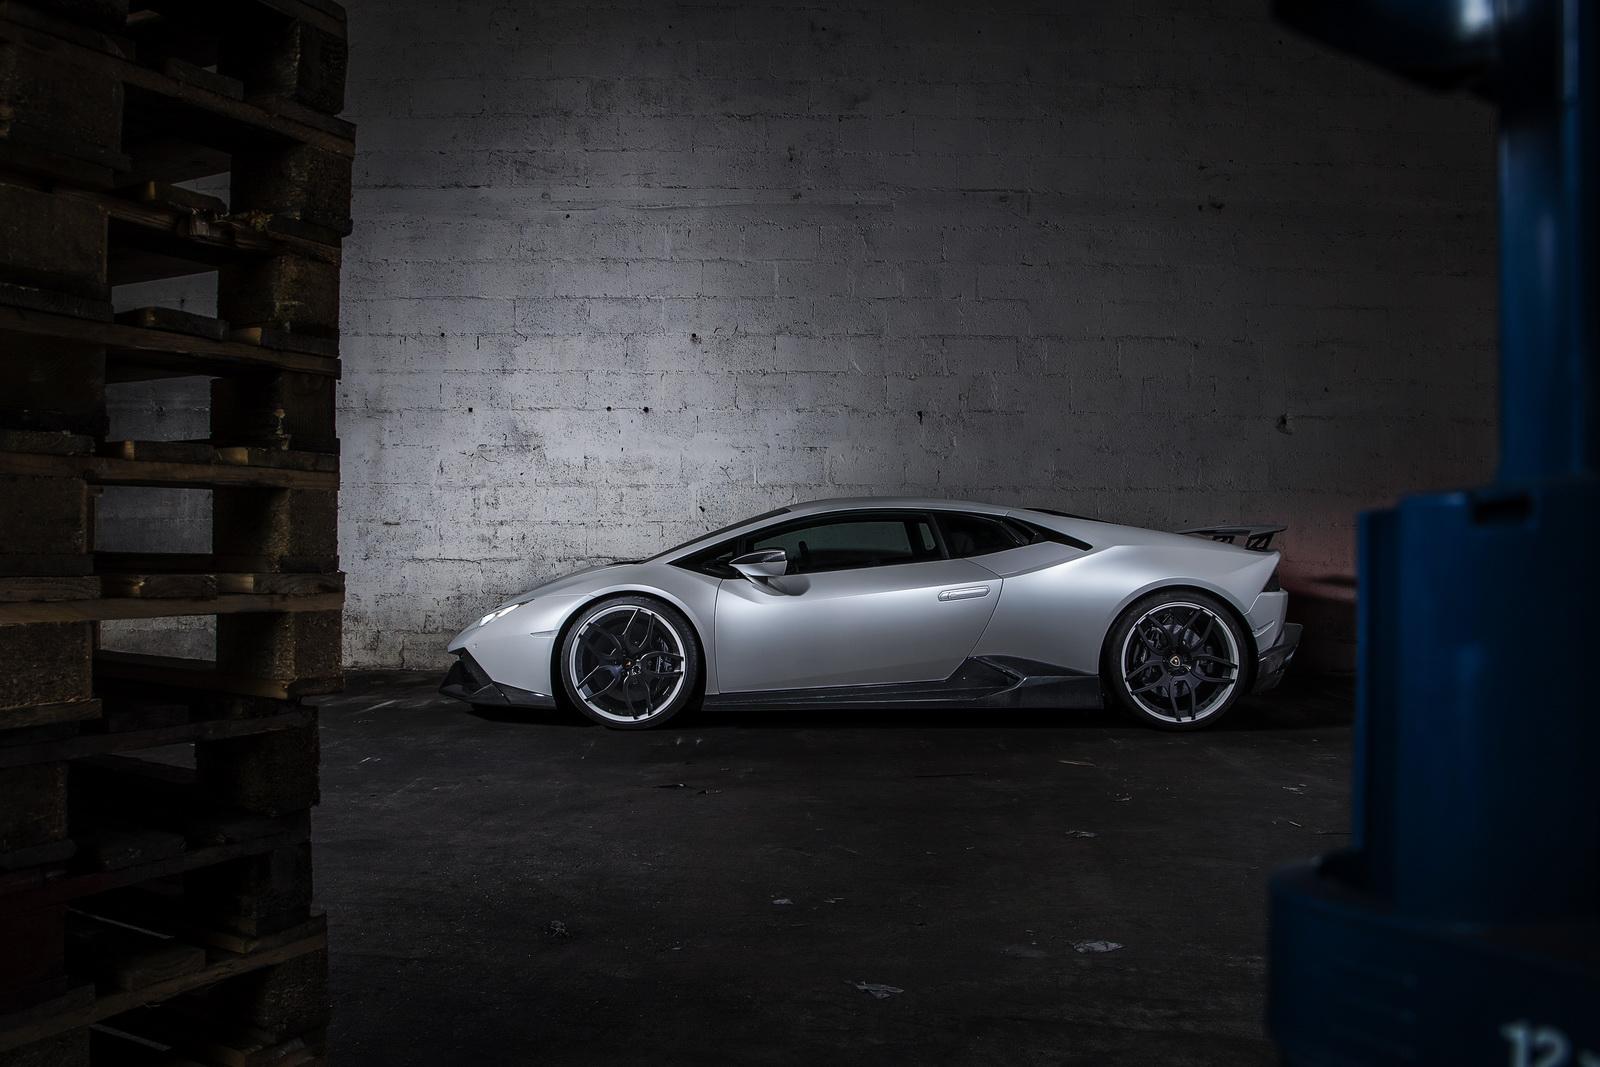 Novitec Torado Gives Lamborghini Huracan A Sexy Suit Of Aero Lingerie Carscoops